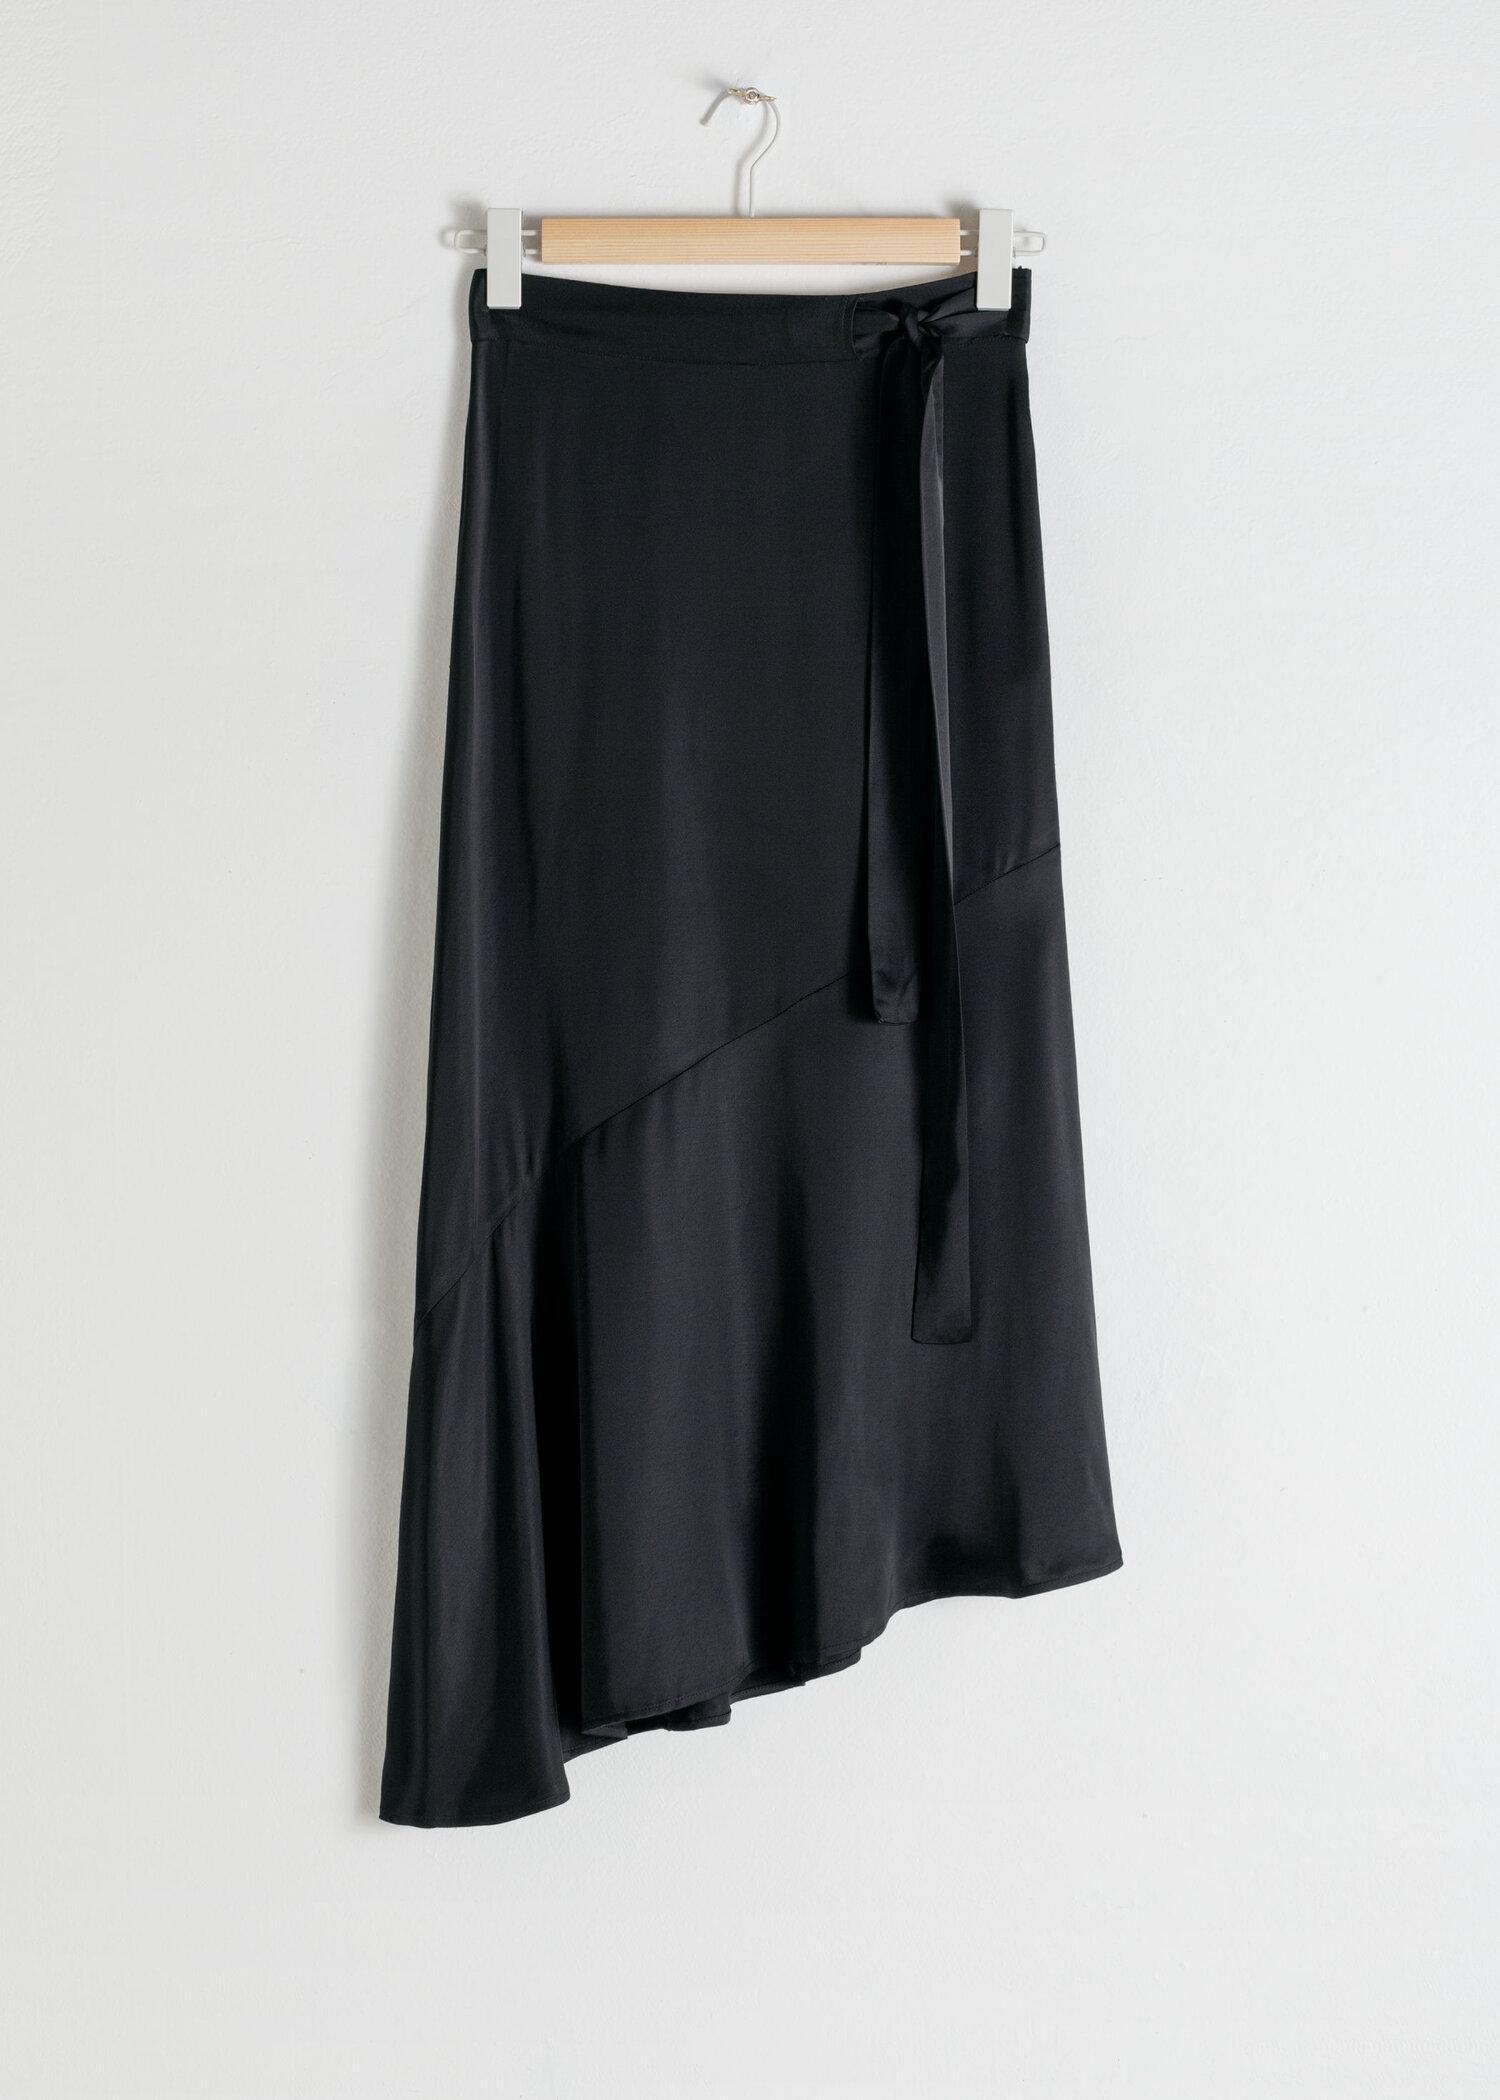 & Other Stories Black Satin Midi Skirt